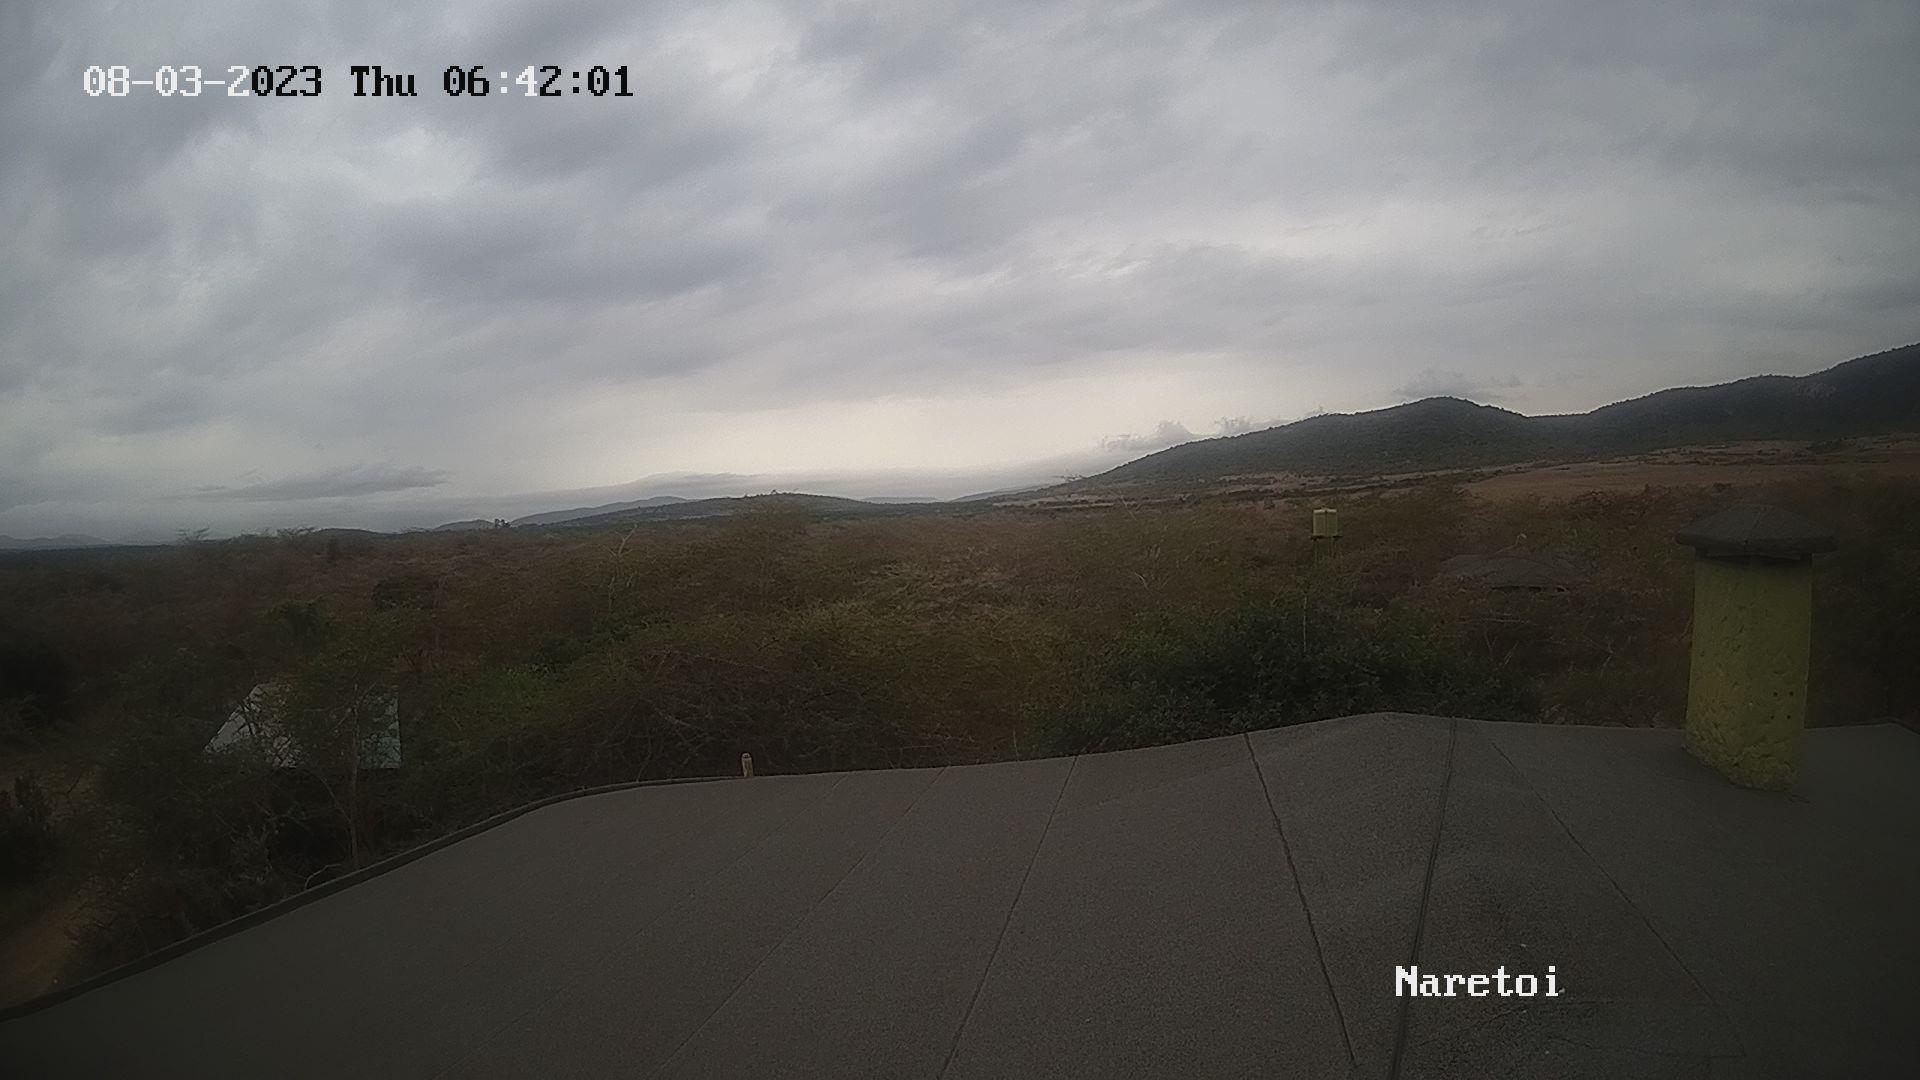 Naretoi, Maasai Mara